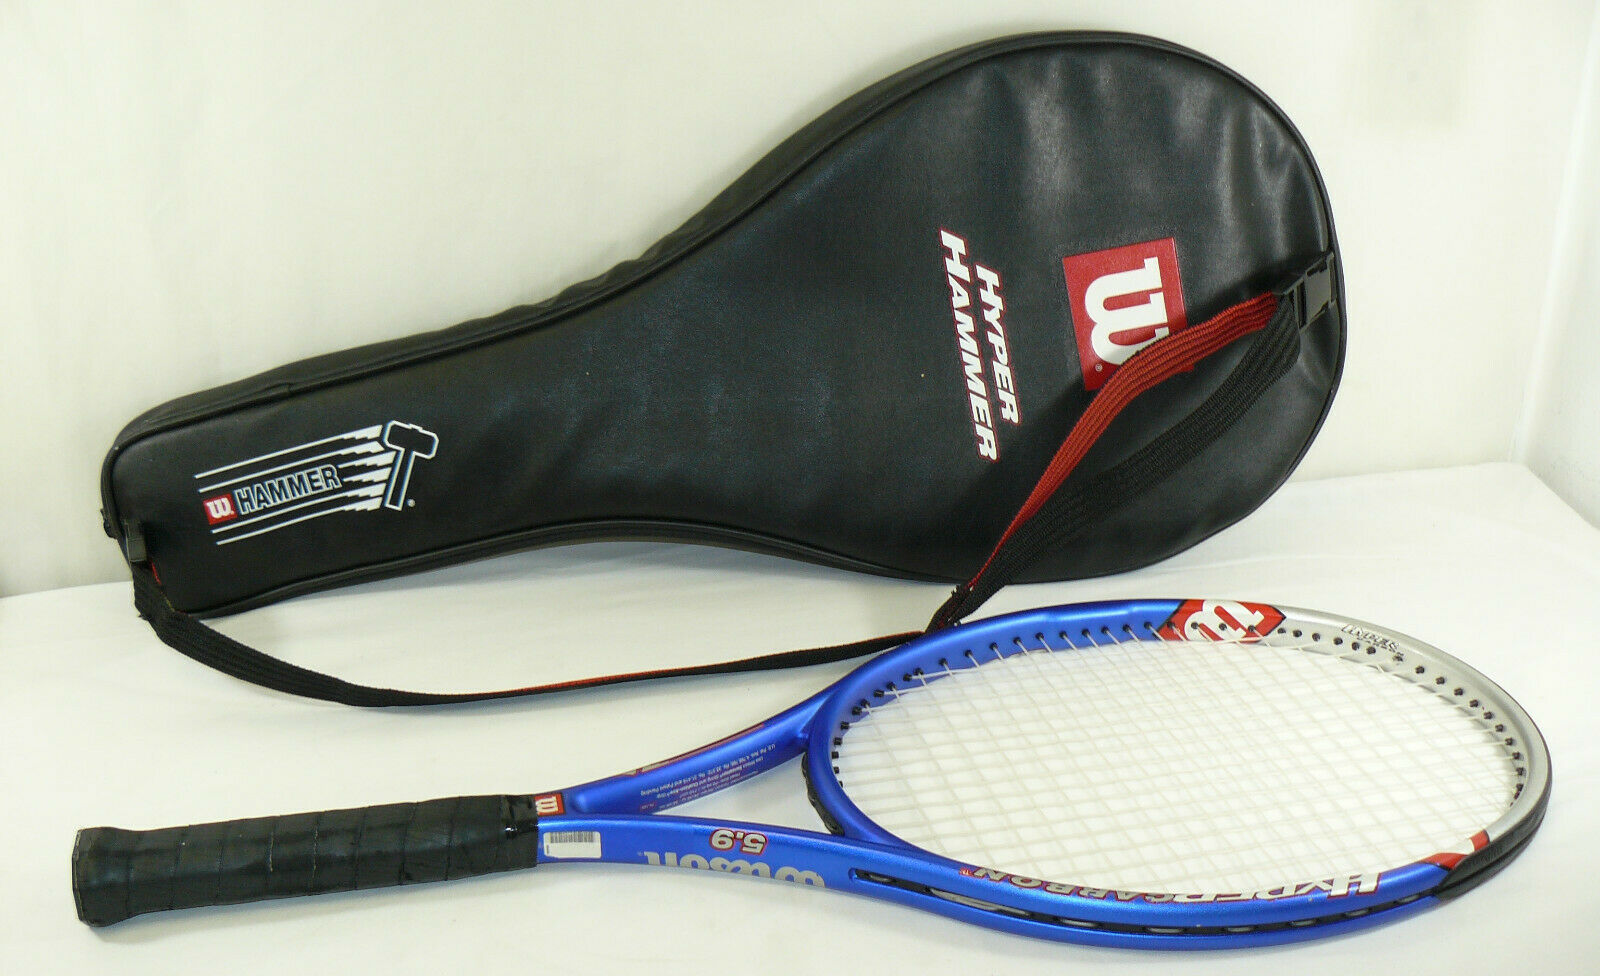 Wilson Hyper Hammer 5.9 Cochebono 110 Sq en cabeza tenis raqueta agarre con bolsa de 4 1 2